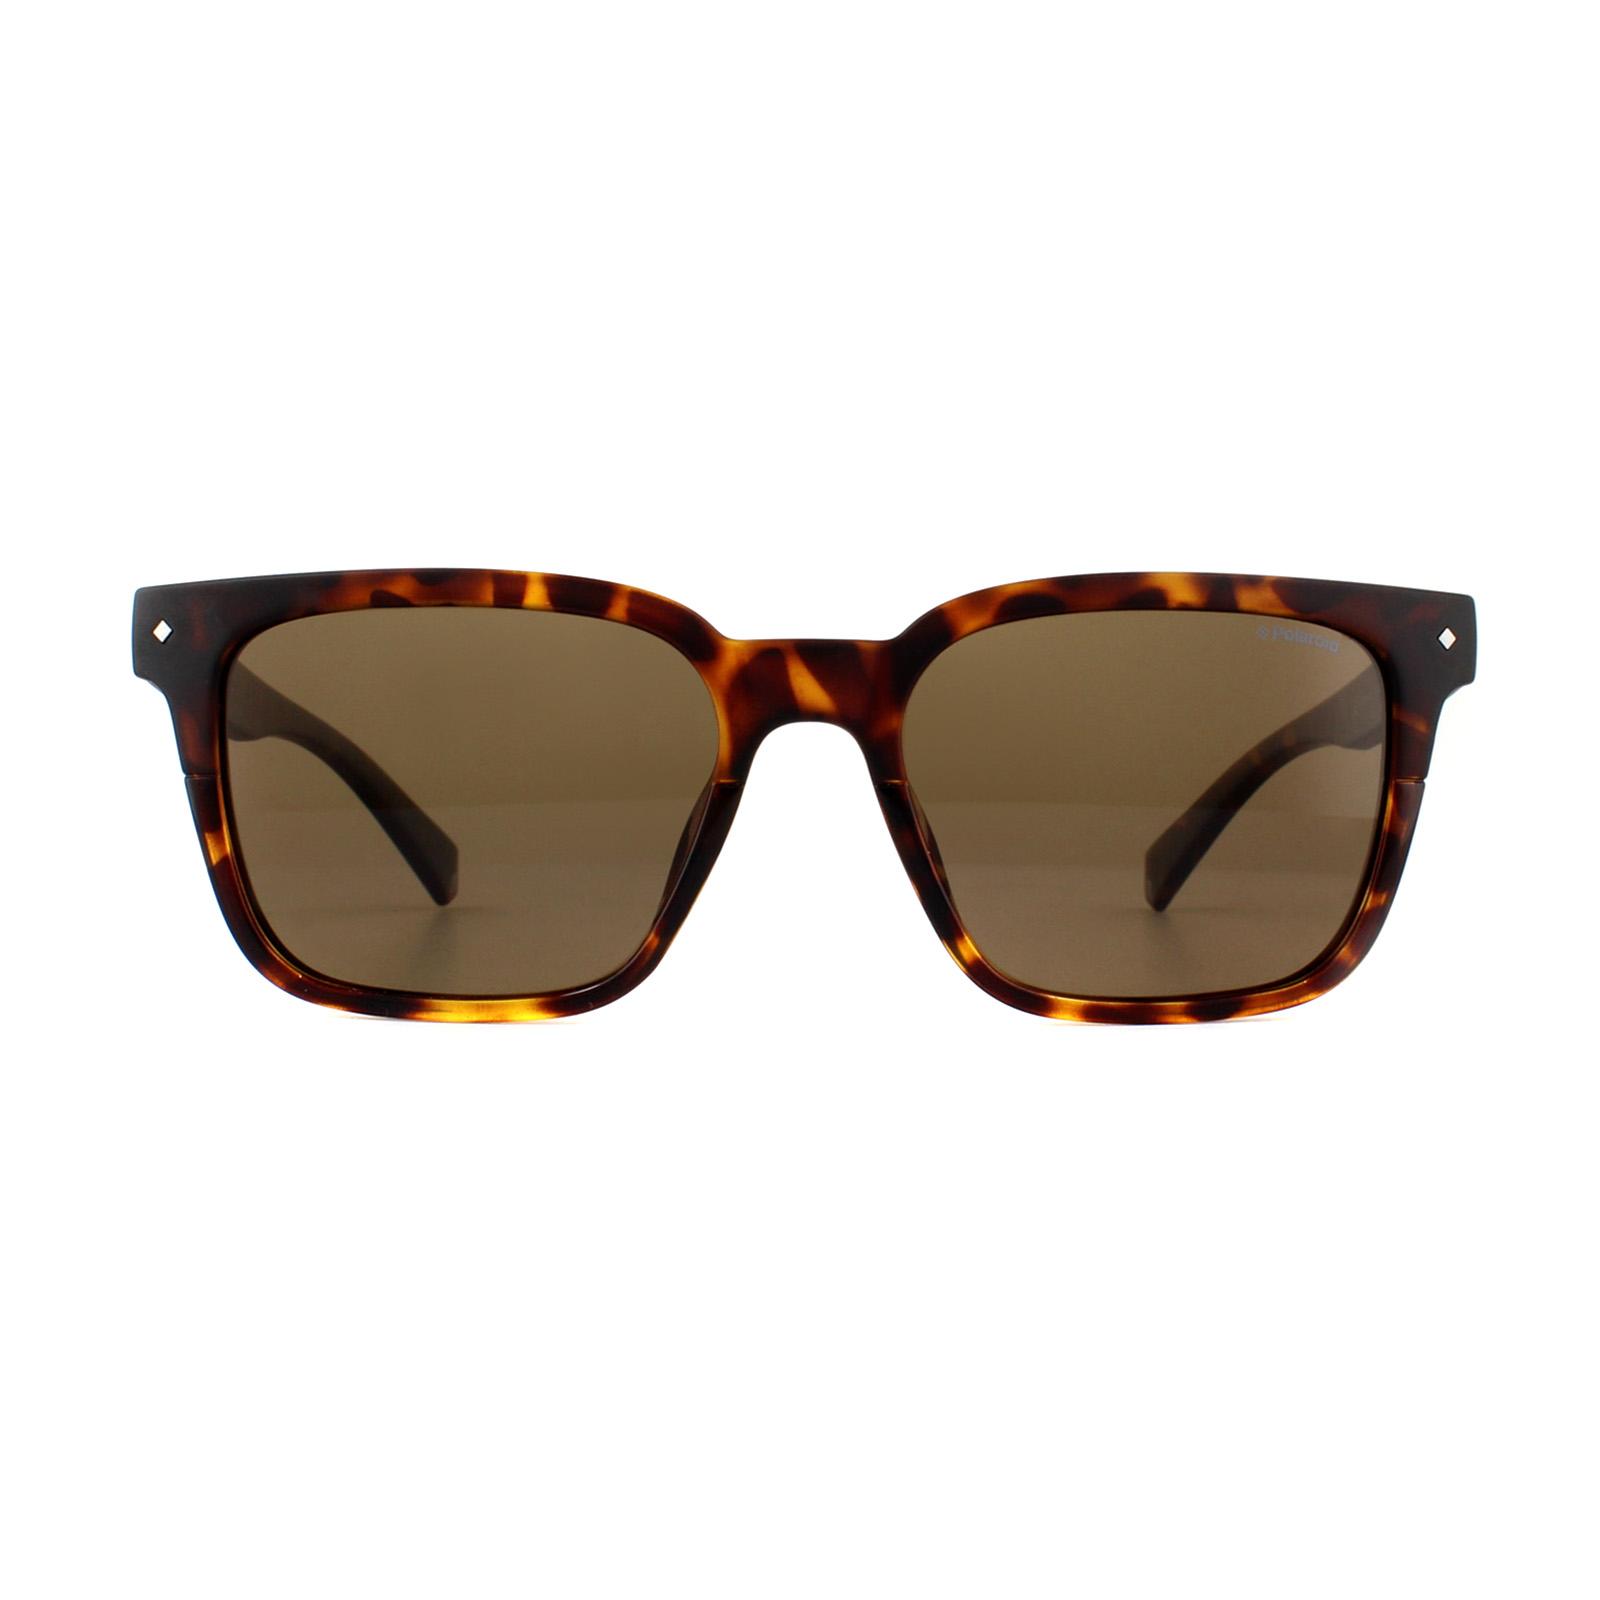 a3659316989 Sentinel Polaroid Sunglasses PLD 6044 S 086 SP Dark Havana Bronze Polarized